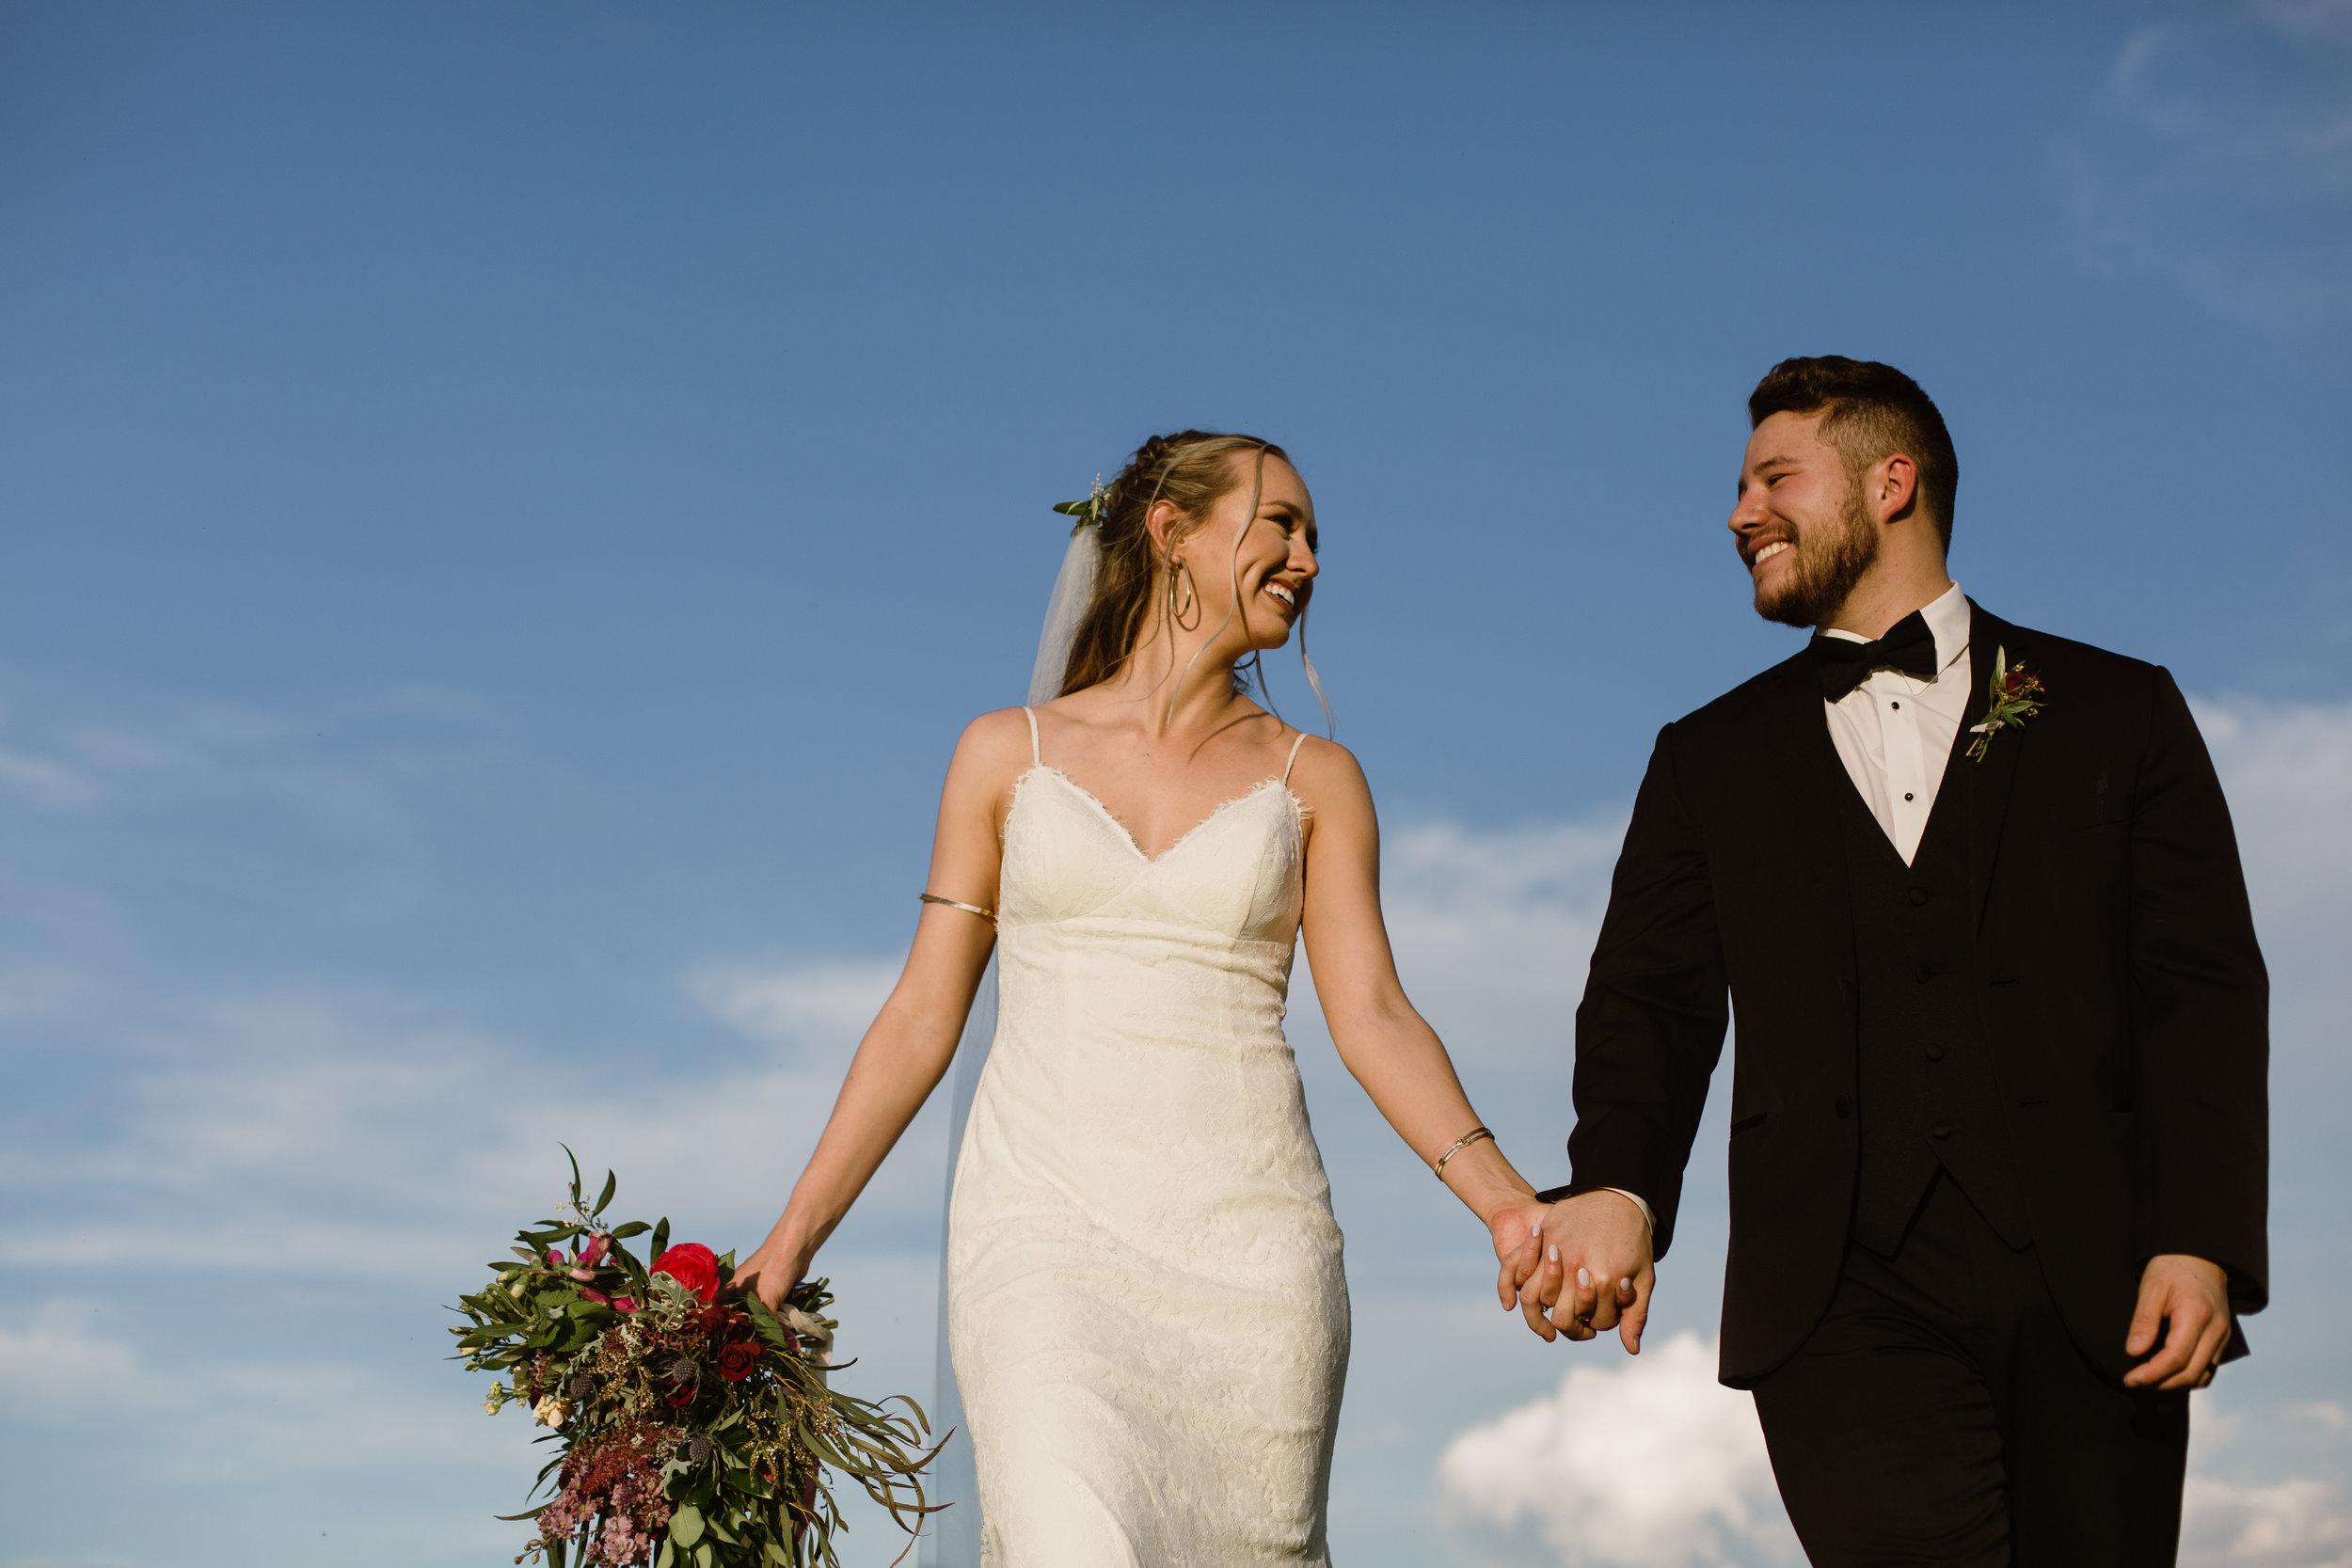 weddingportfolio-18.jpg